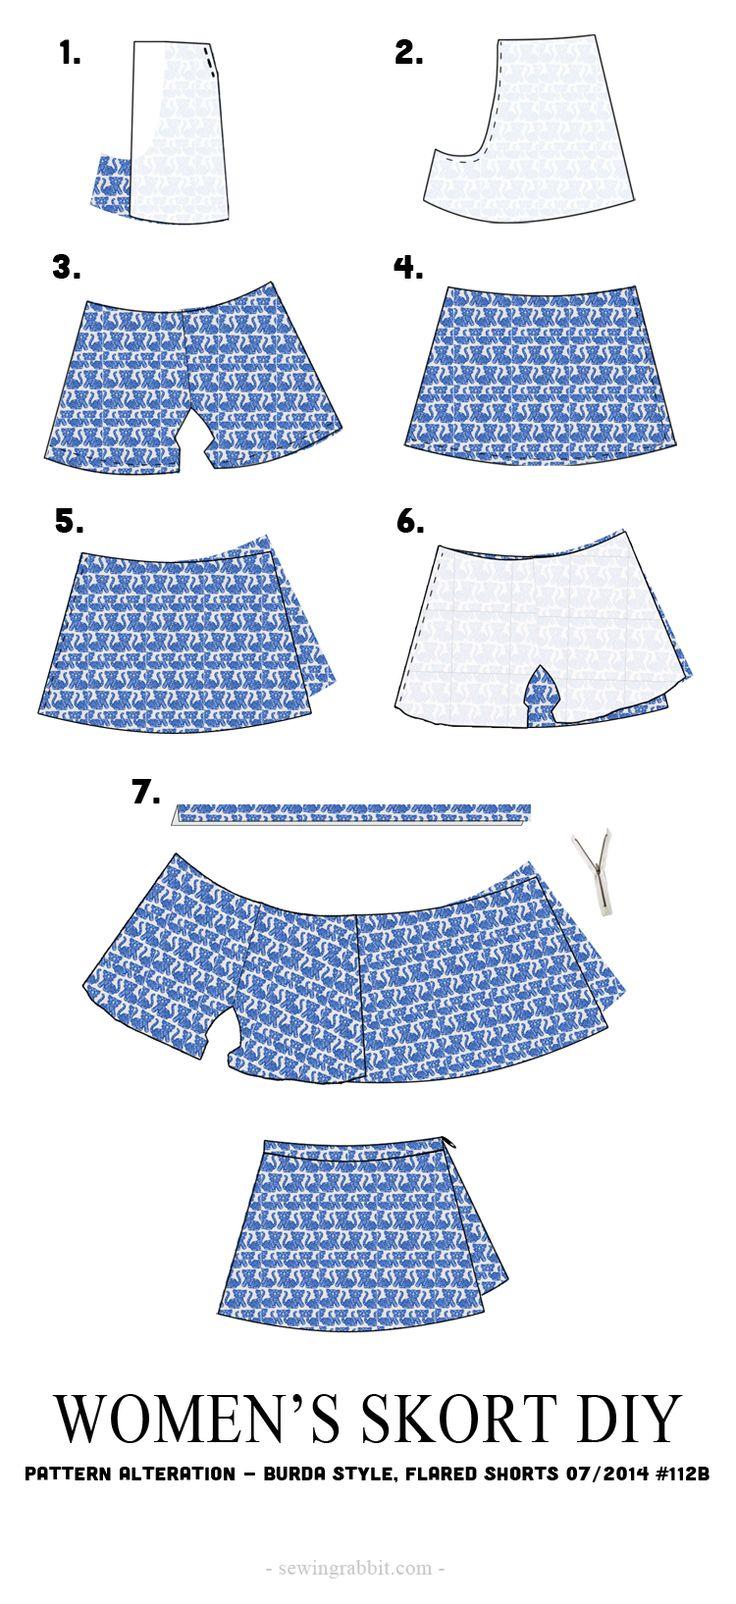 Women's Skort DIY - The Sewing Rabbit